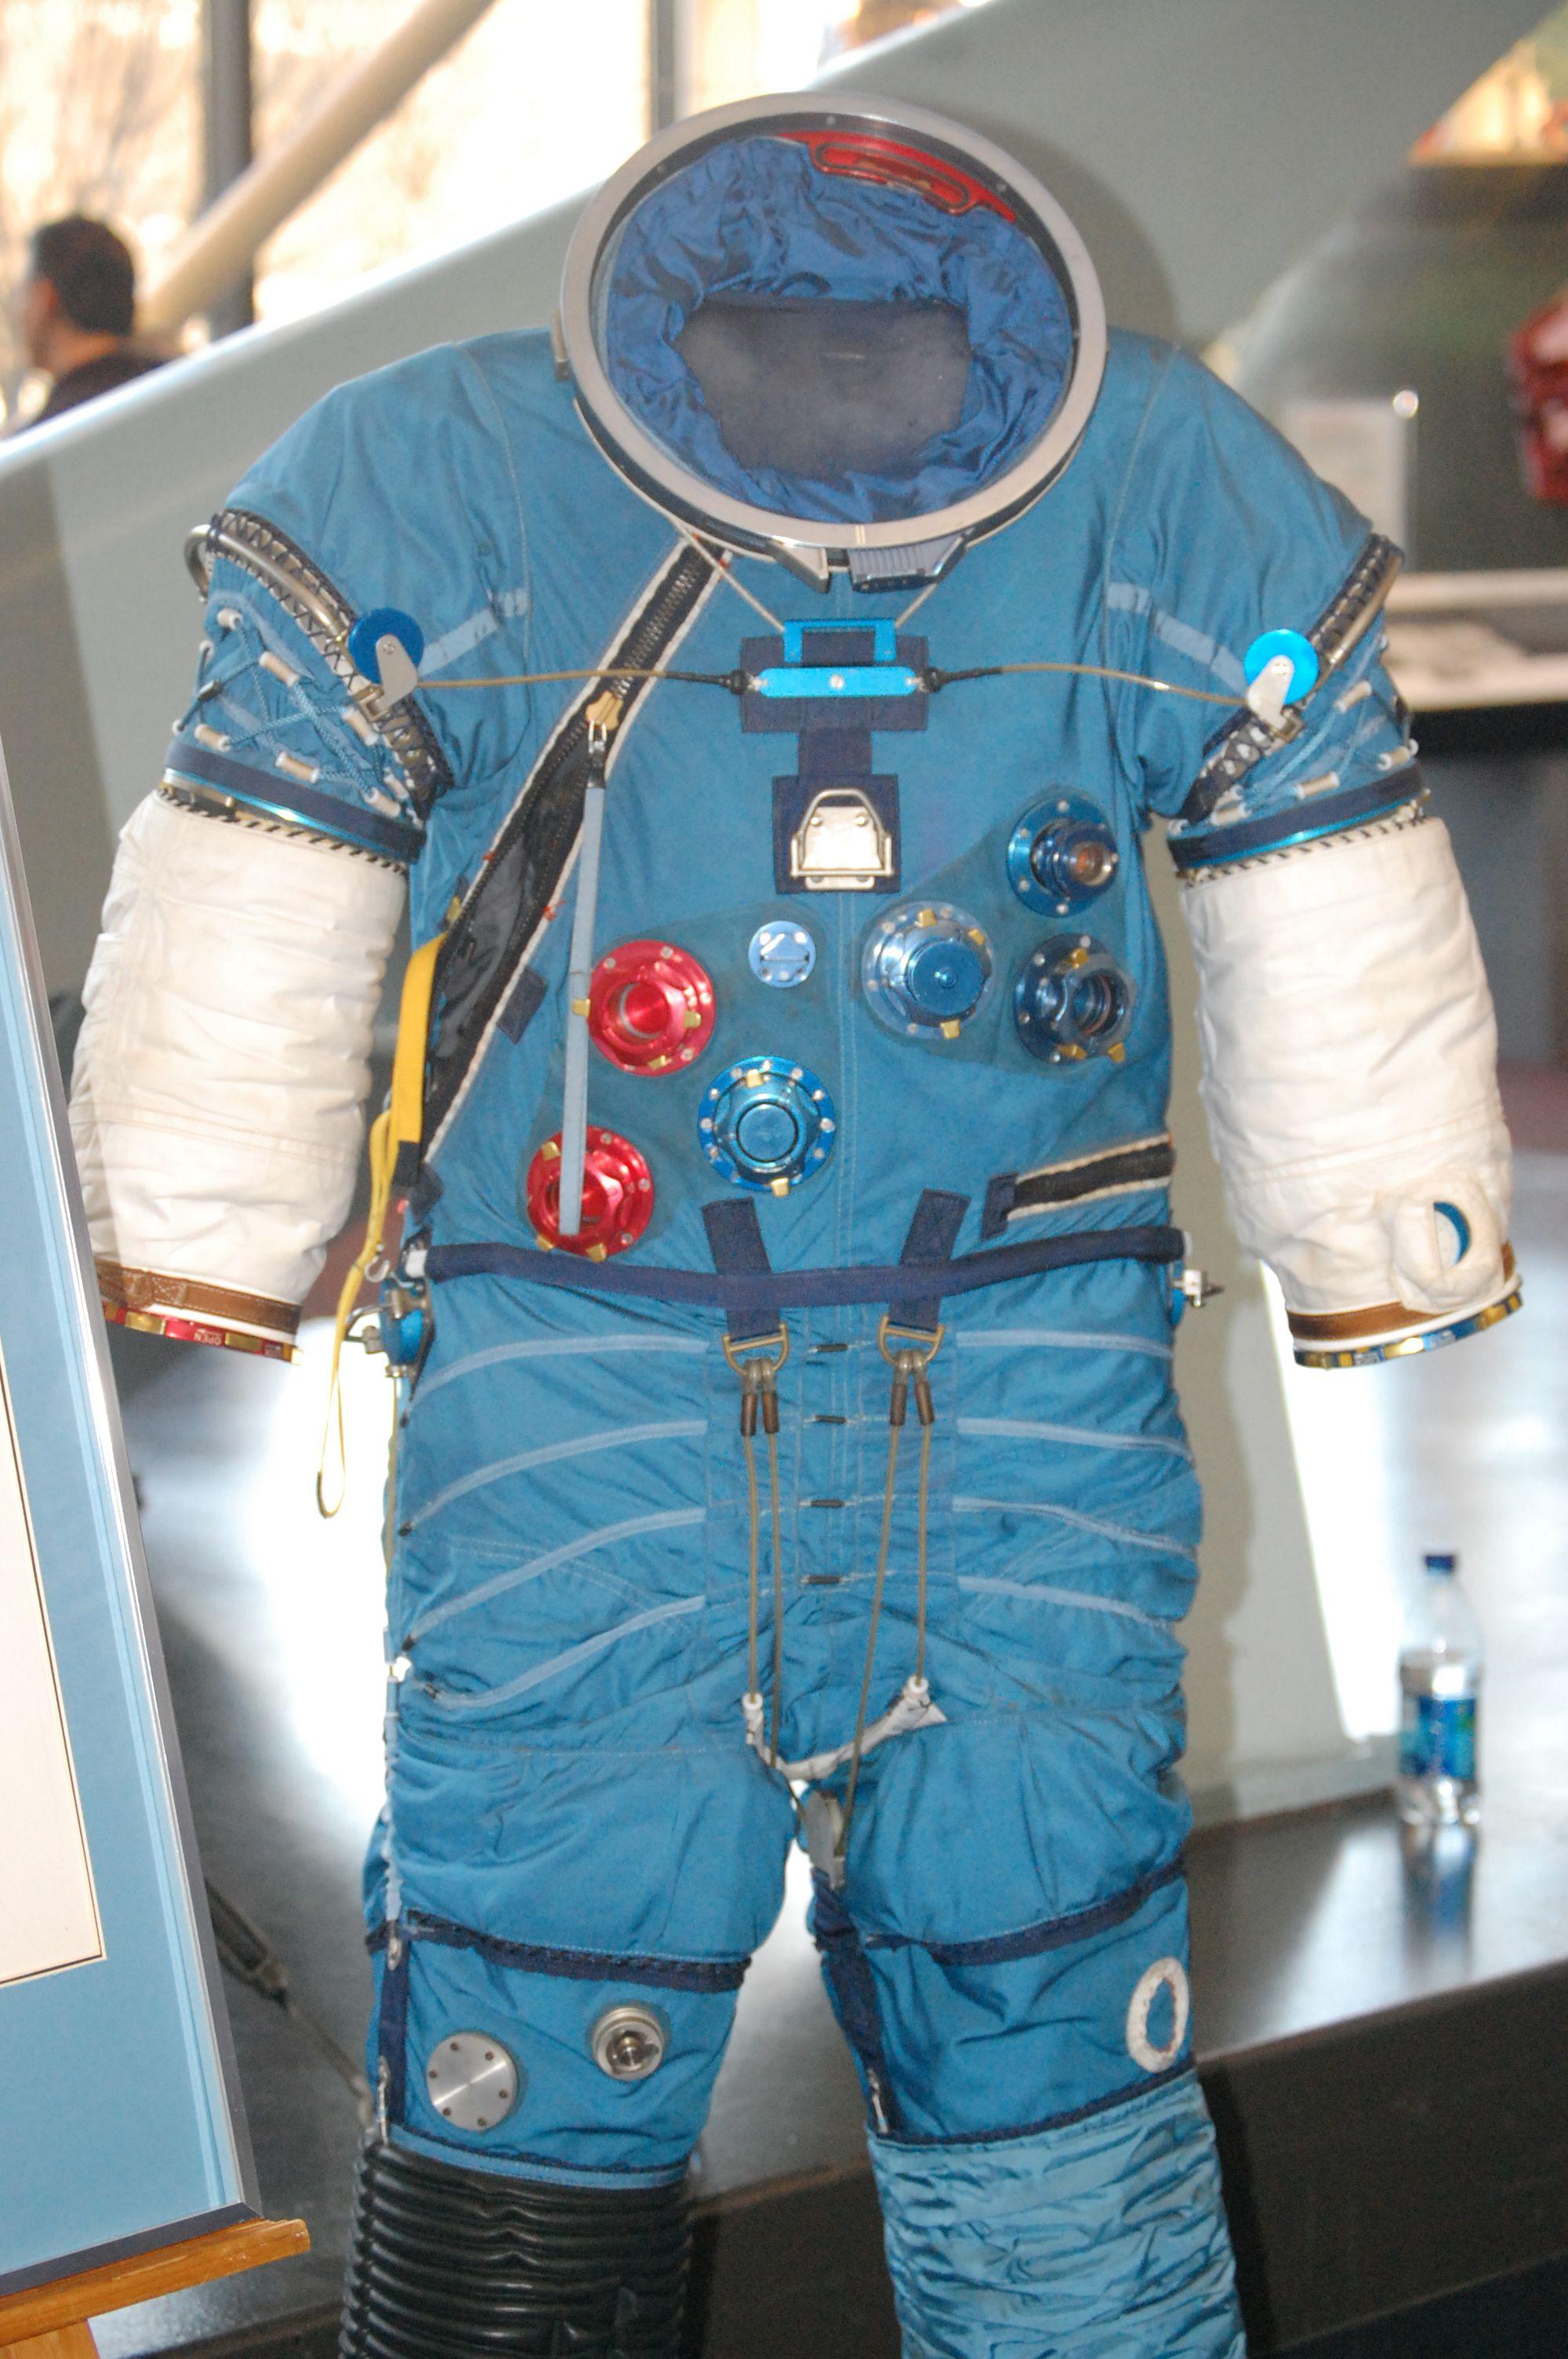 apollo mission space suit - photo #35